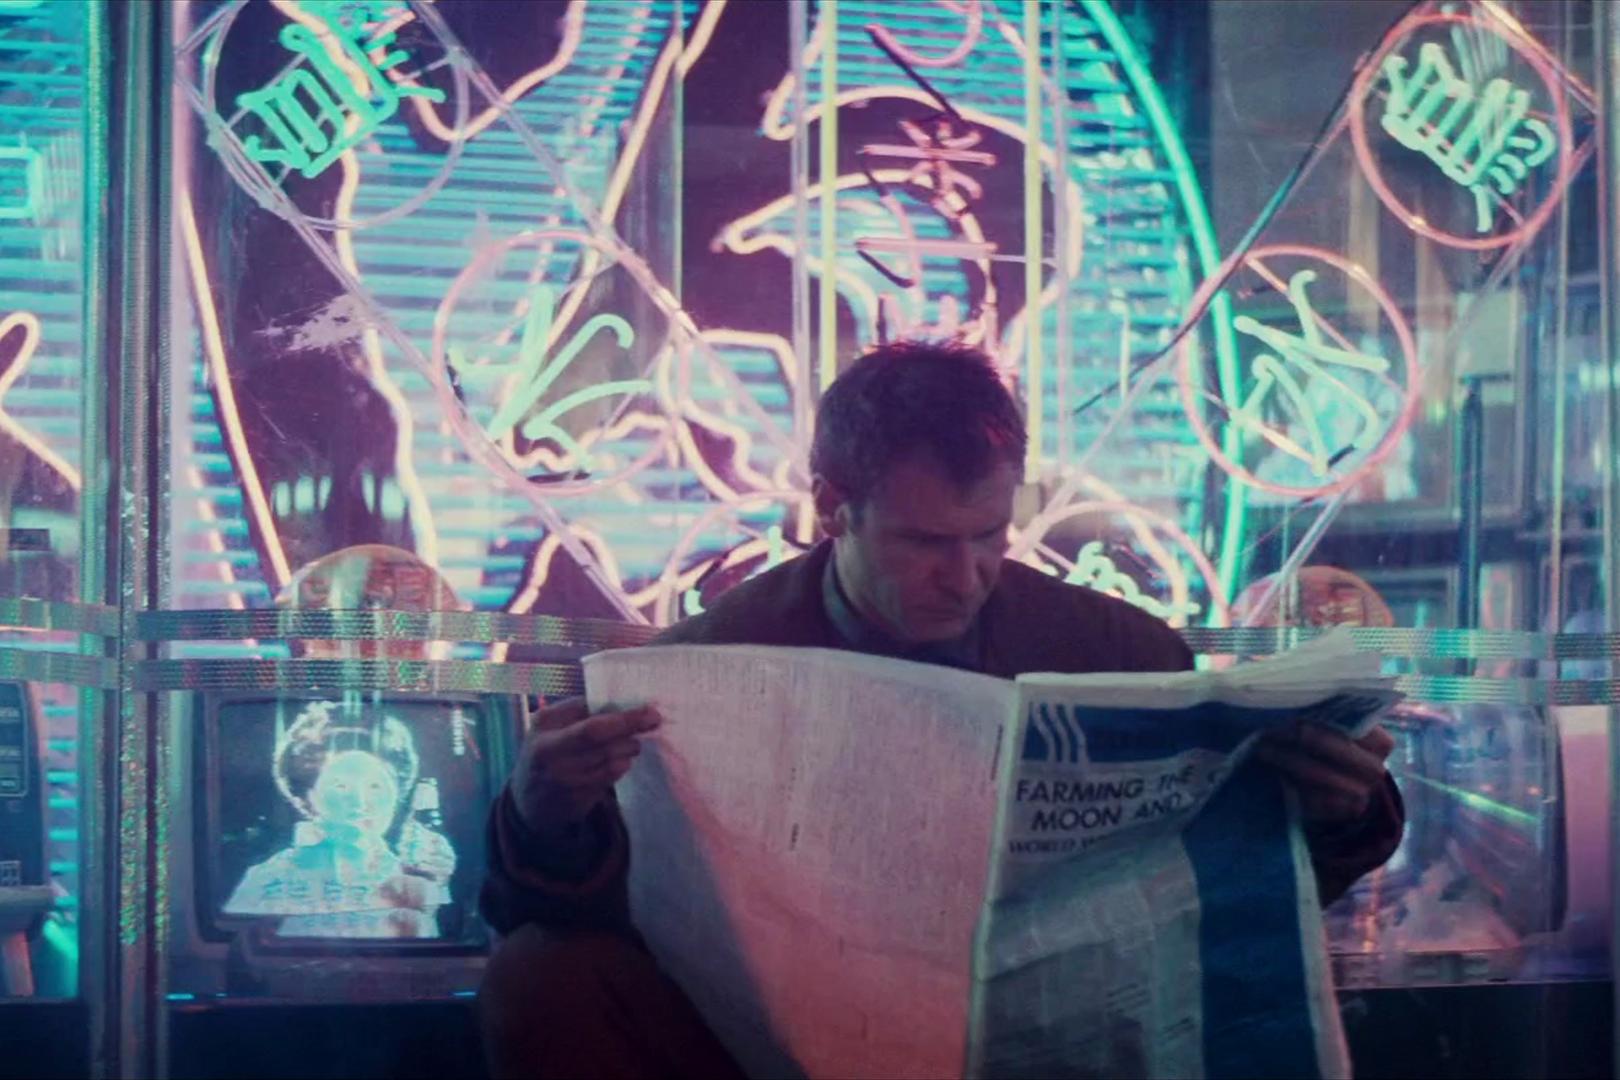 Blade Runner (1982) - Directed by: Ridley ScottWritten by: Hampton Fancher & David Webb Peoples